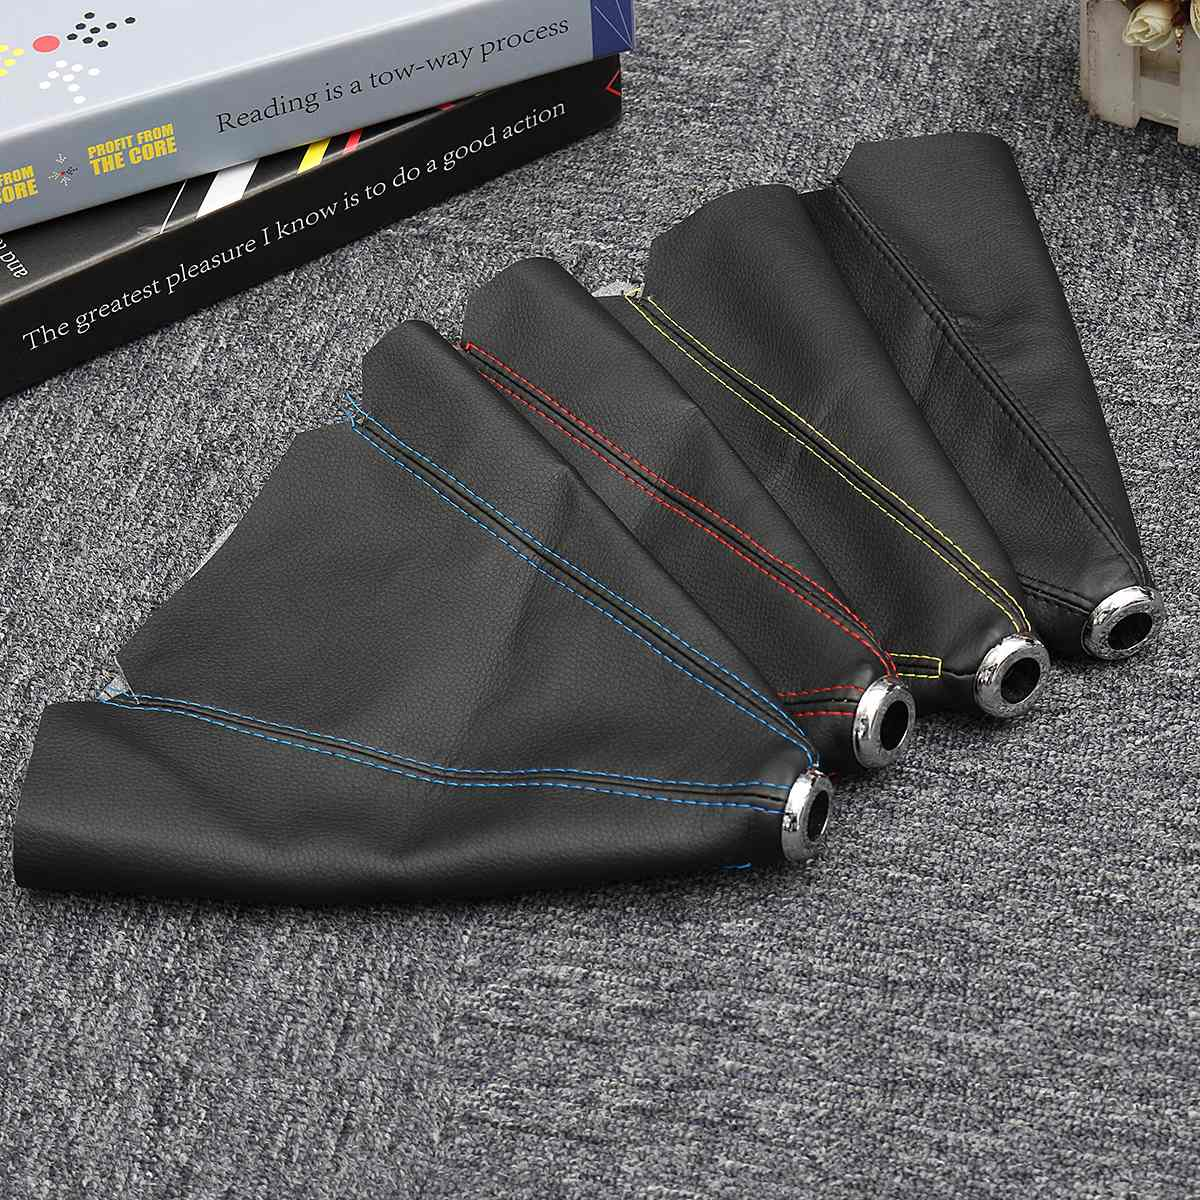 Collar Universal de cambio de marchas de coche de 15mm, cubierta antipolvo para botas de polaina, cubierta de cuero de PVC para Honda/VW/Toyota/BMW